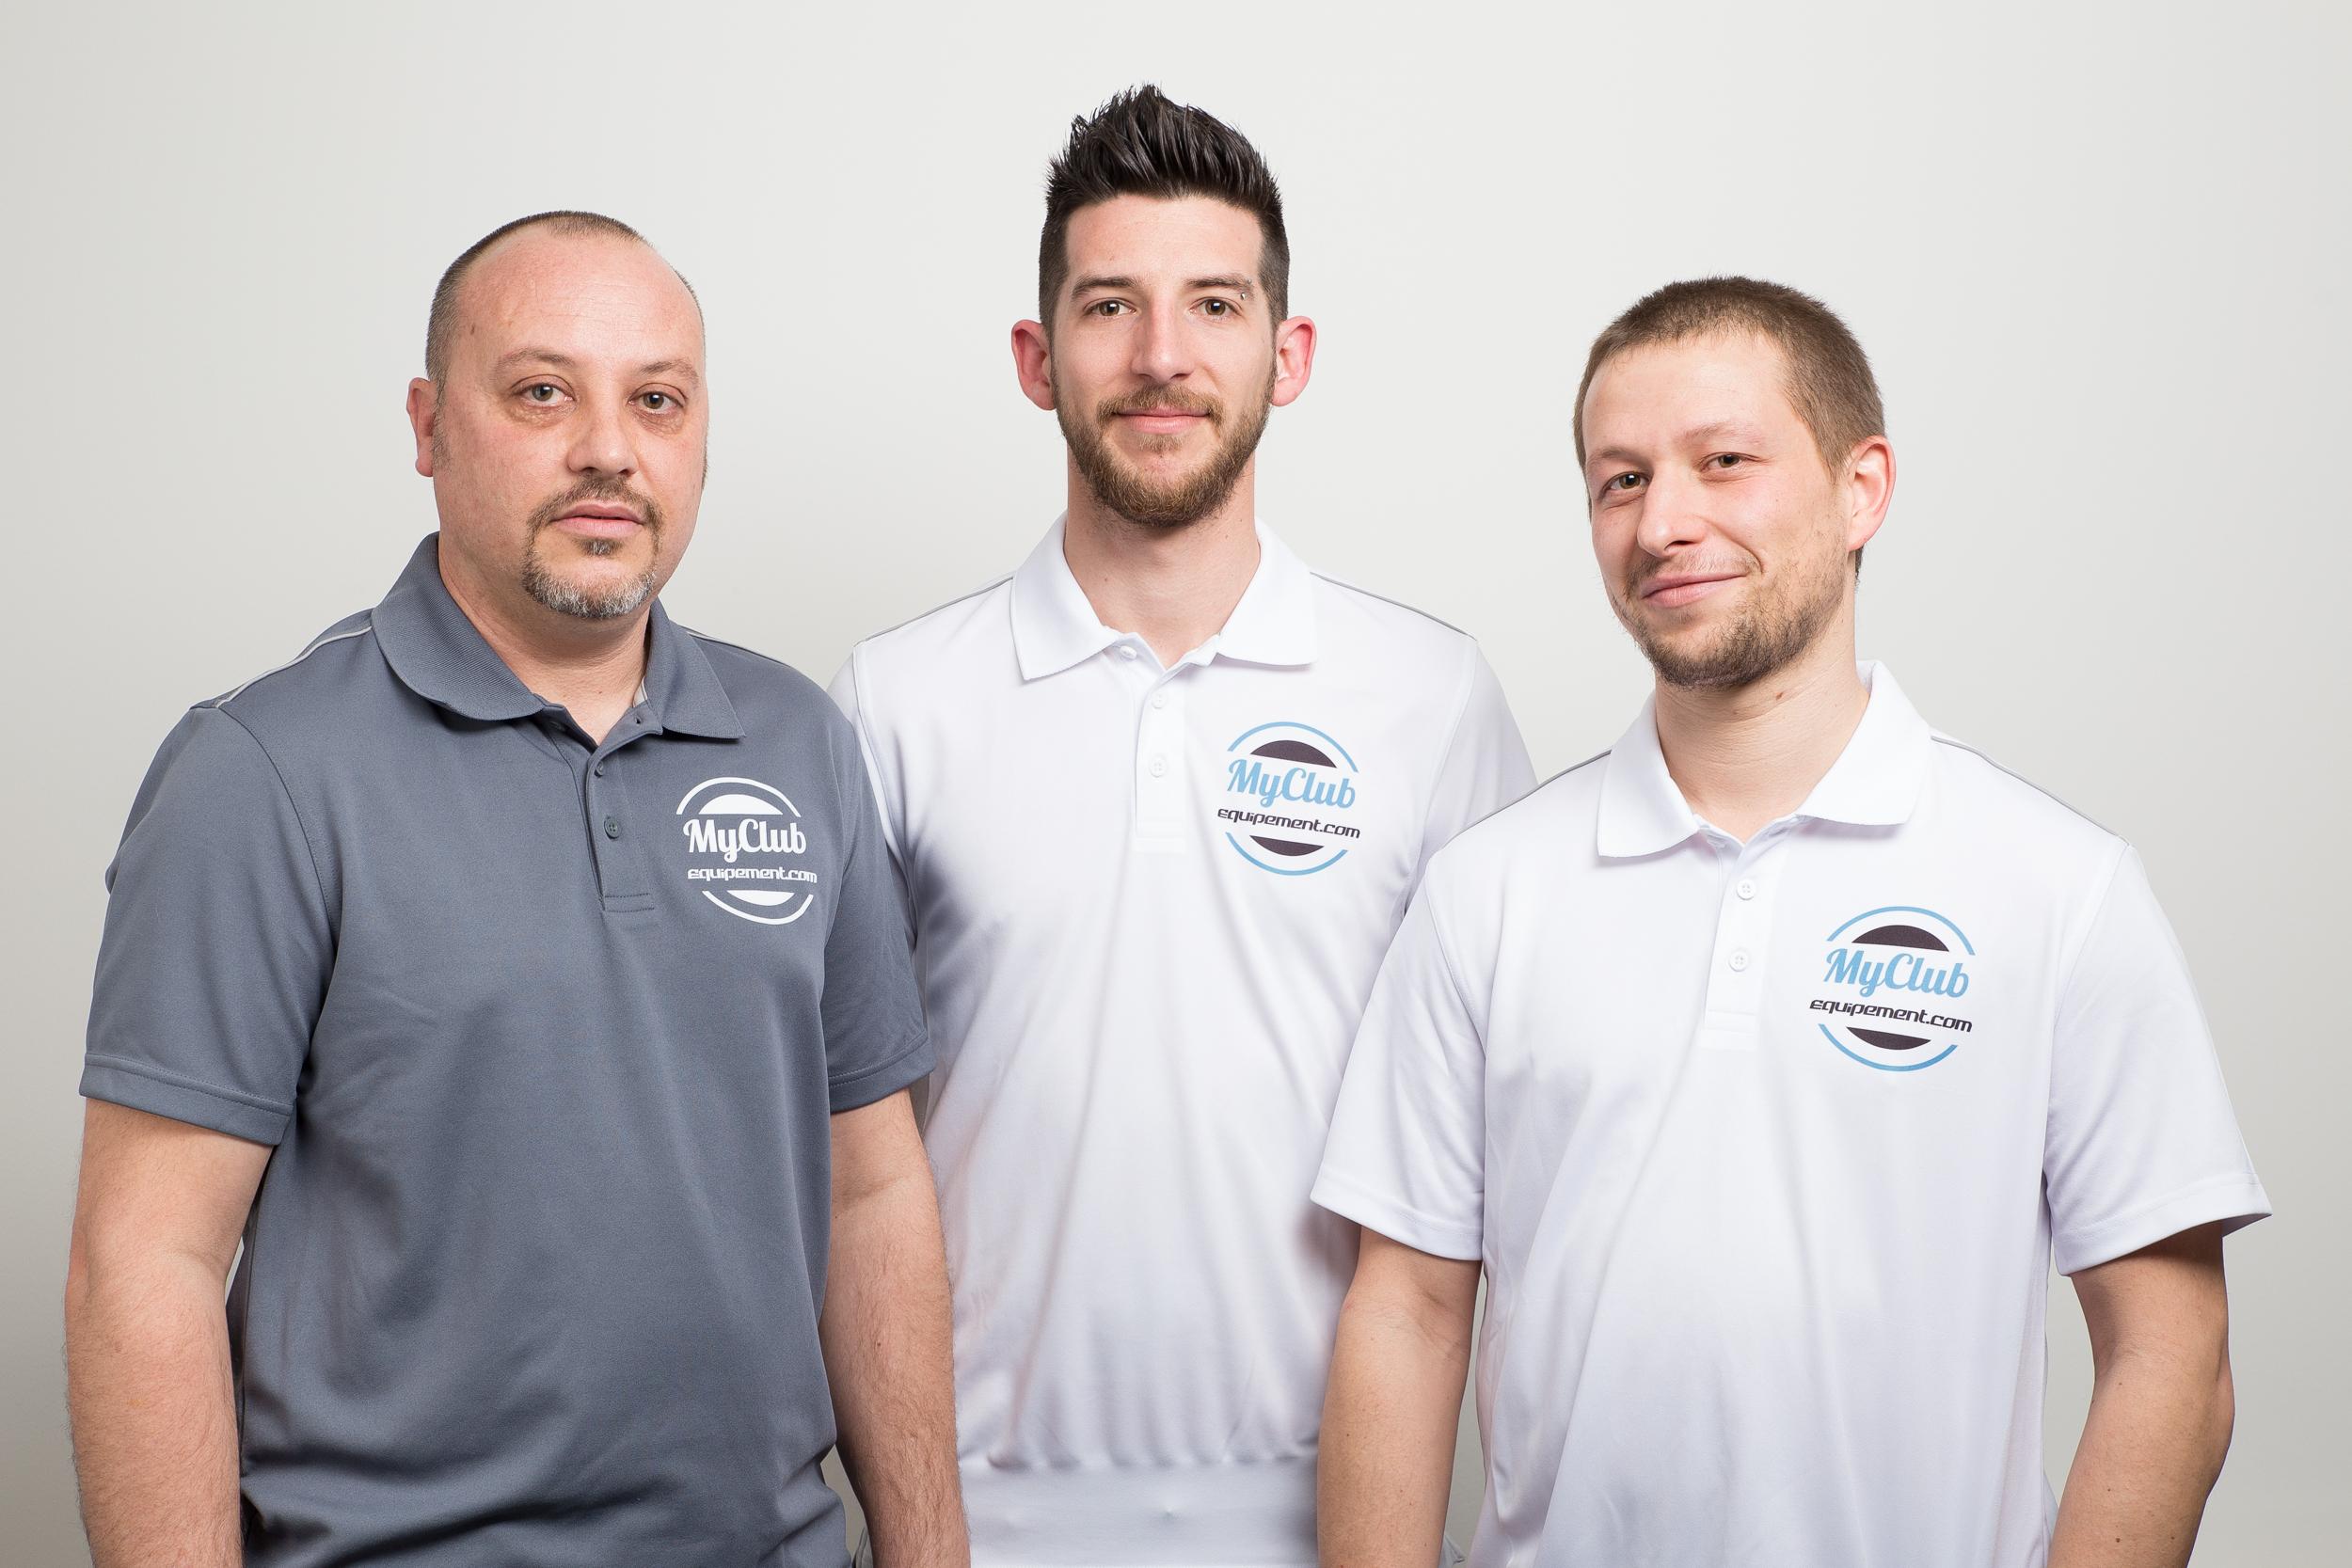 Equipe My Club Equipement - Equipement sportif en ligne